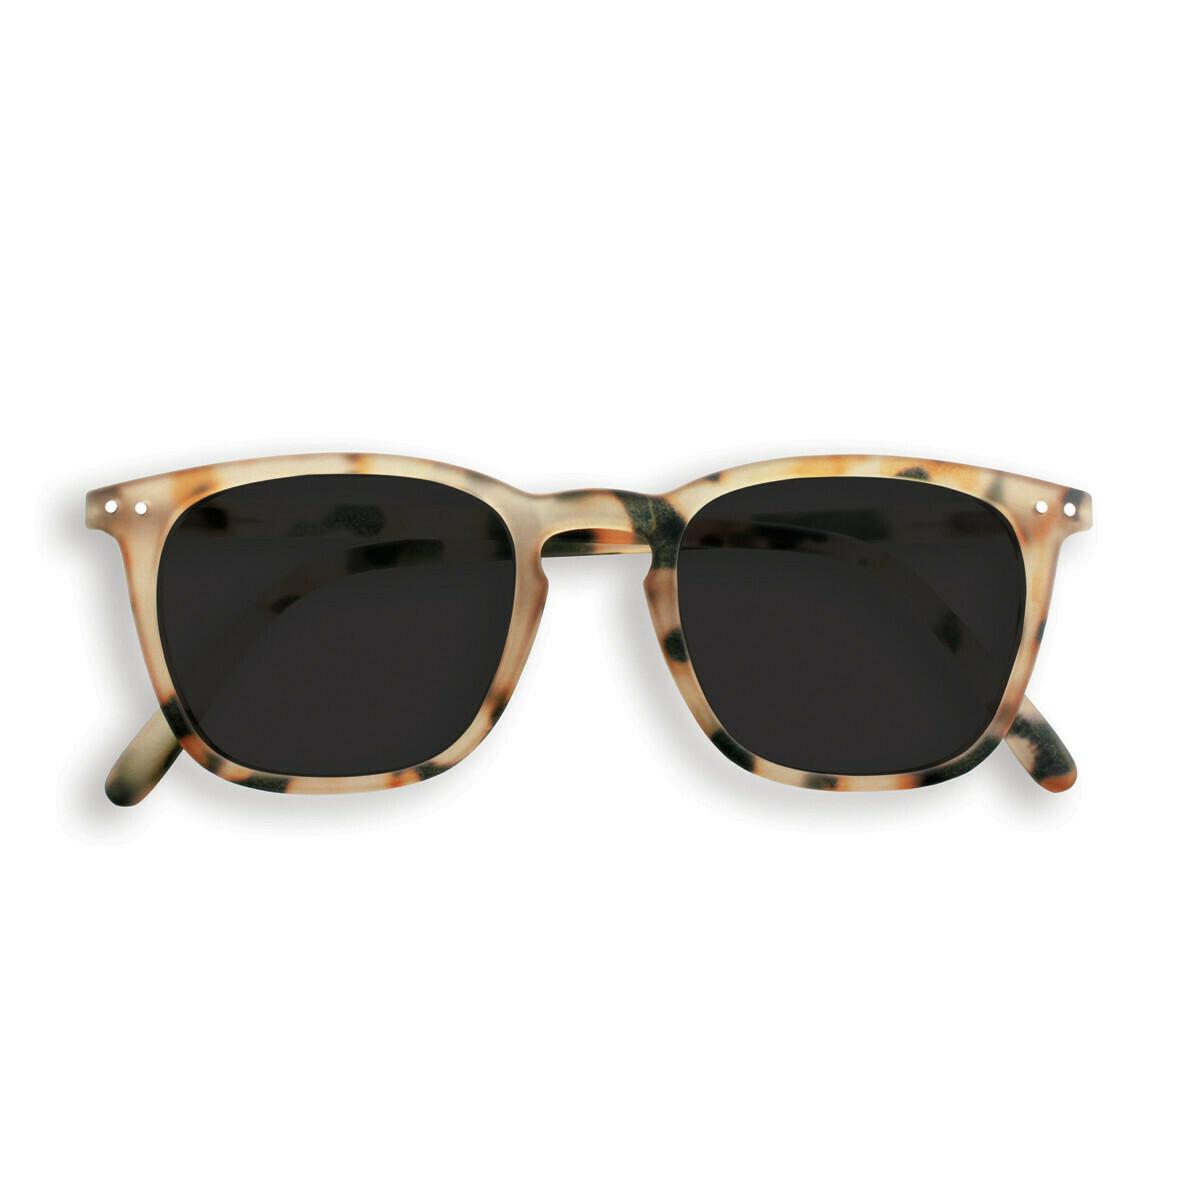 Sunglasses #E - Light Tortoise